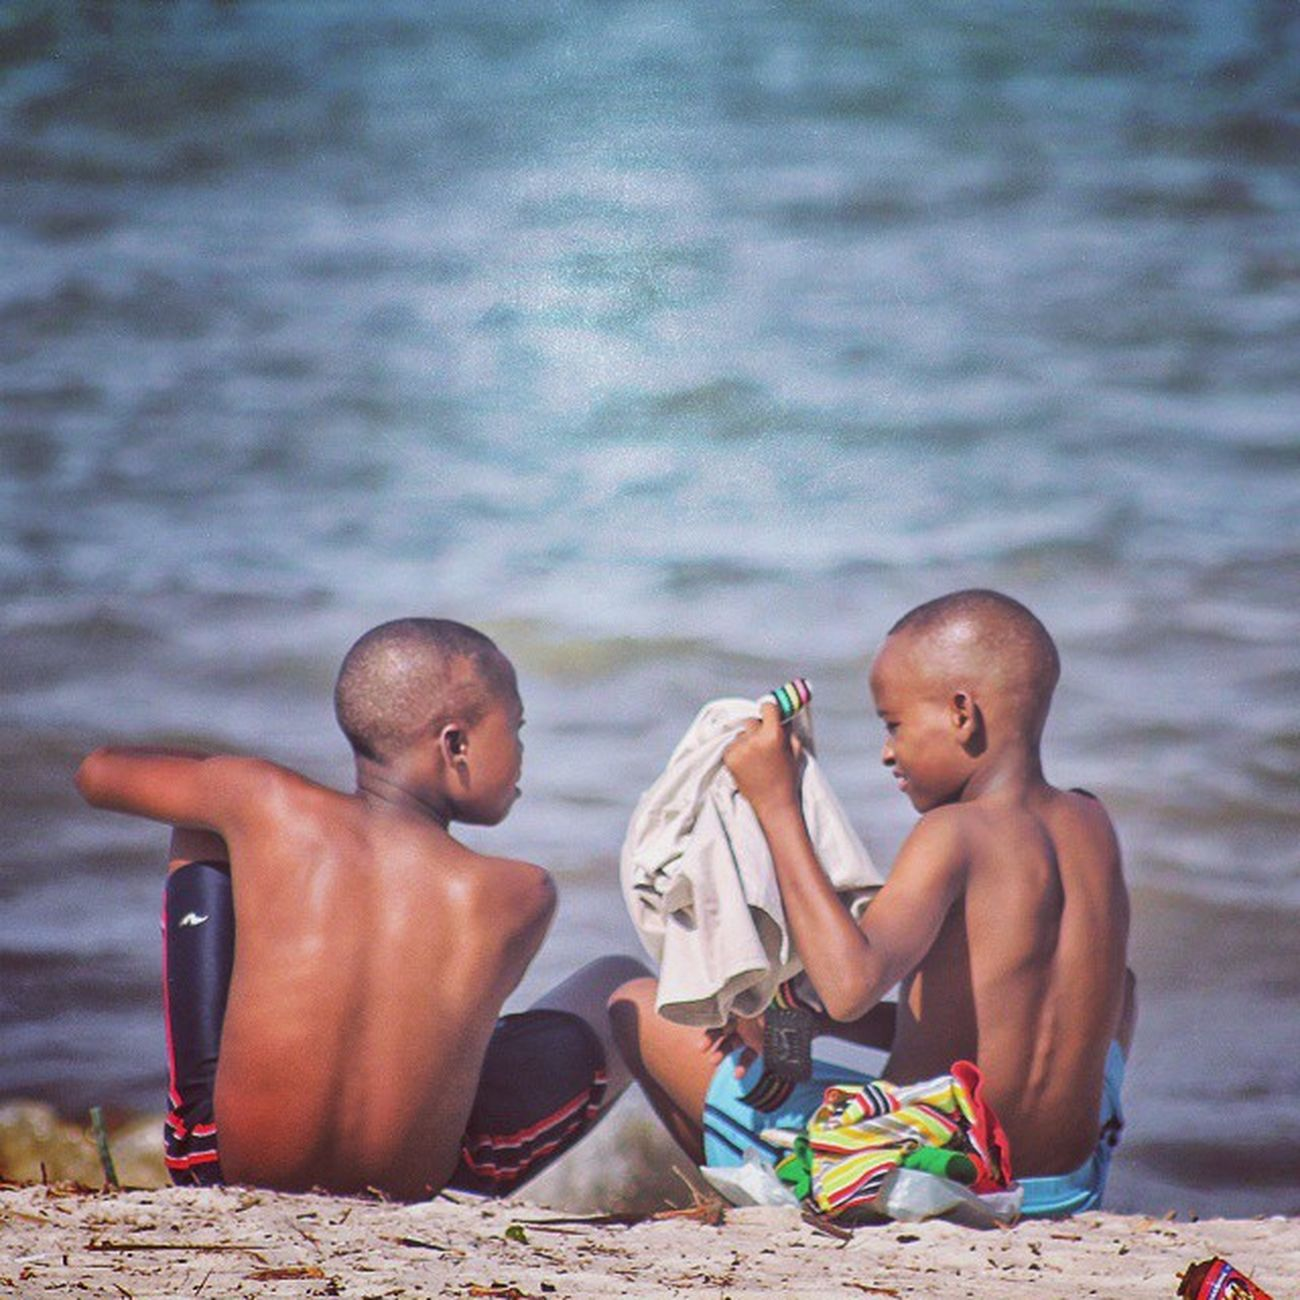 Friendship ✌ . . . MyTanzania Beach Friends Together Kids_of_our_world Visiterlafrique Vscotanzania Tanzania Hakunamatata ✌